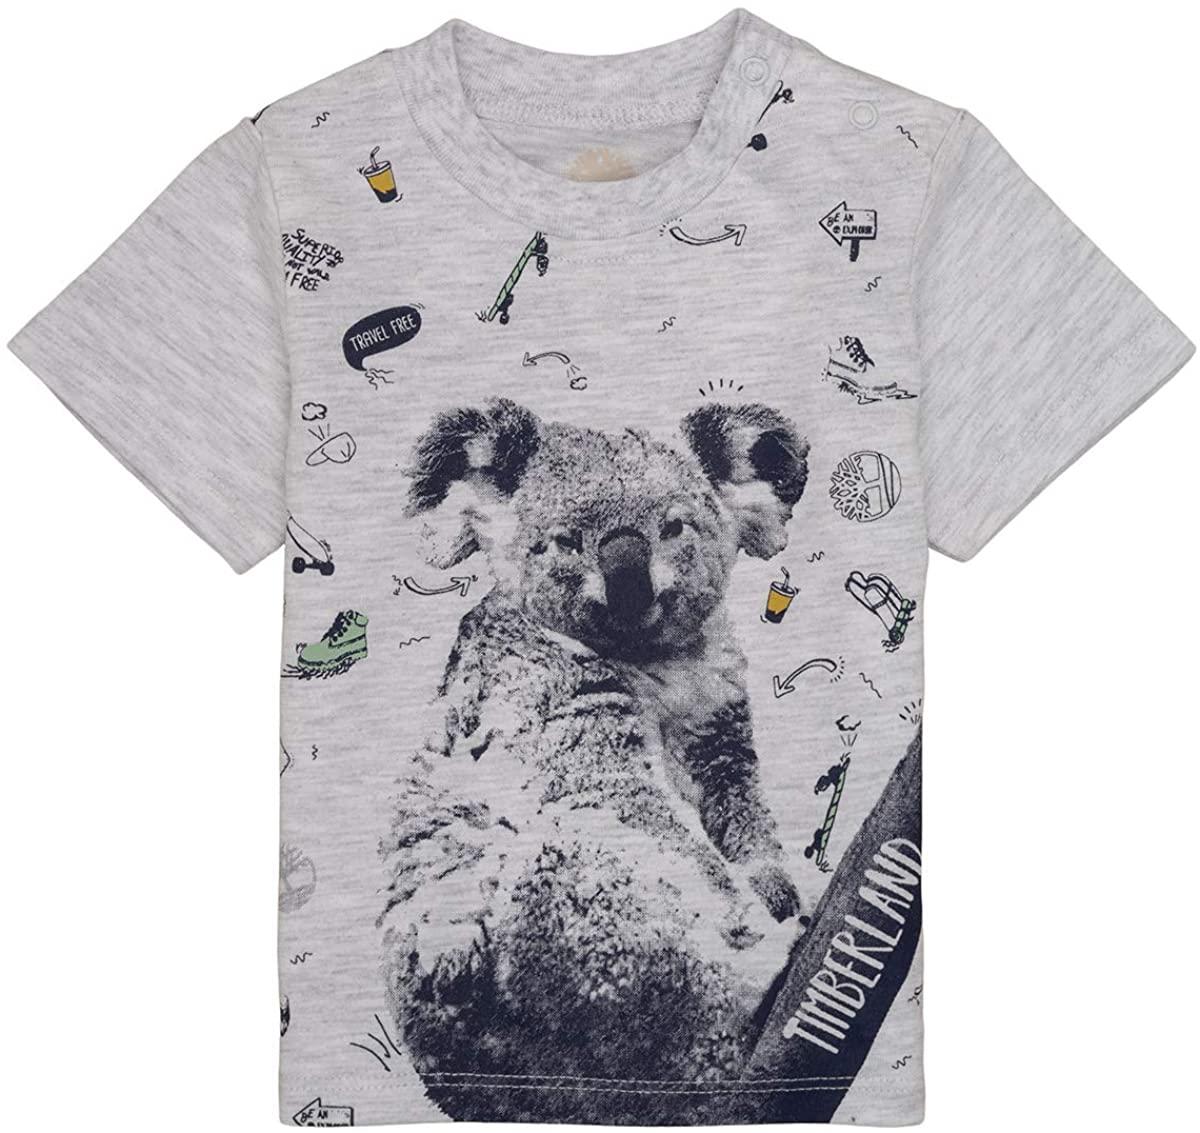 Timberland Marius T-Shirts & Polo Shirts Boys Grey - 6 Months - Short-Sleeved T-Shirts Shirt